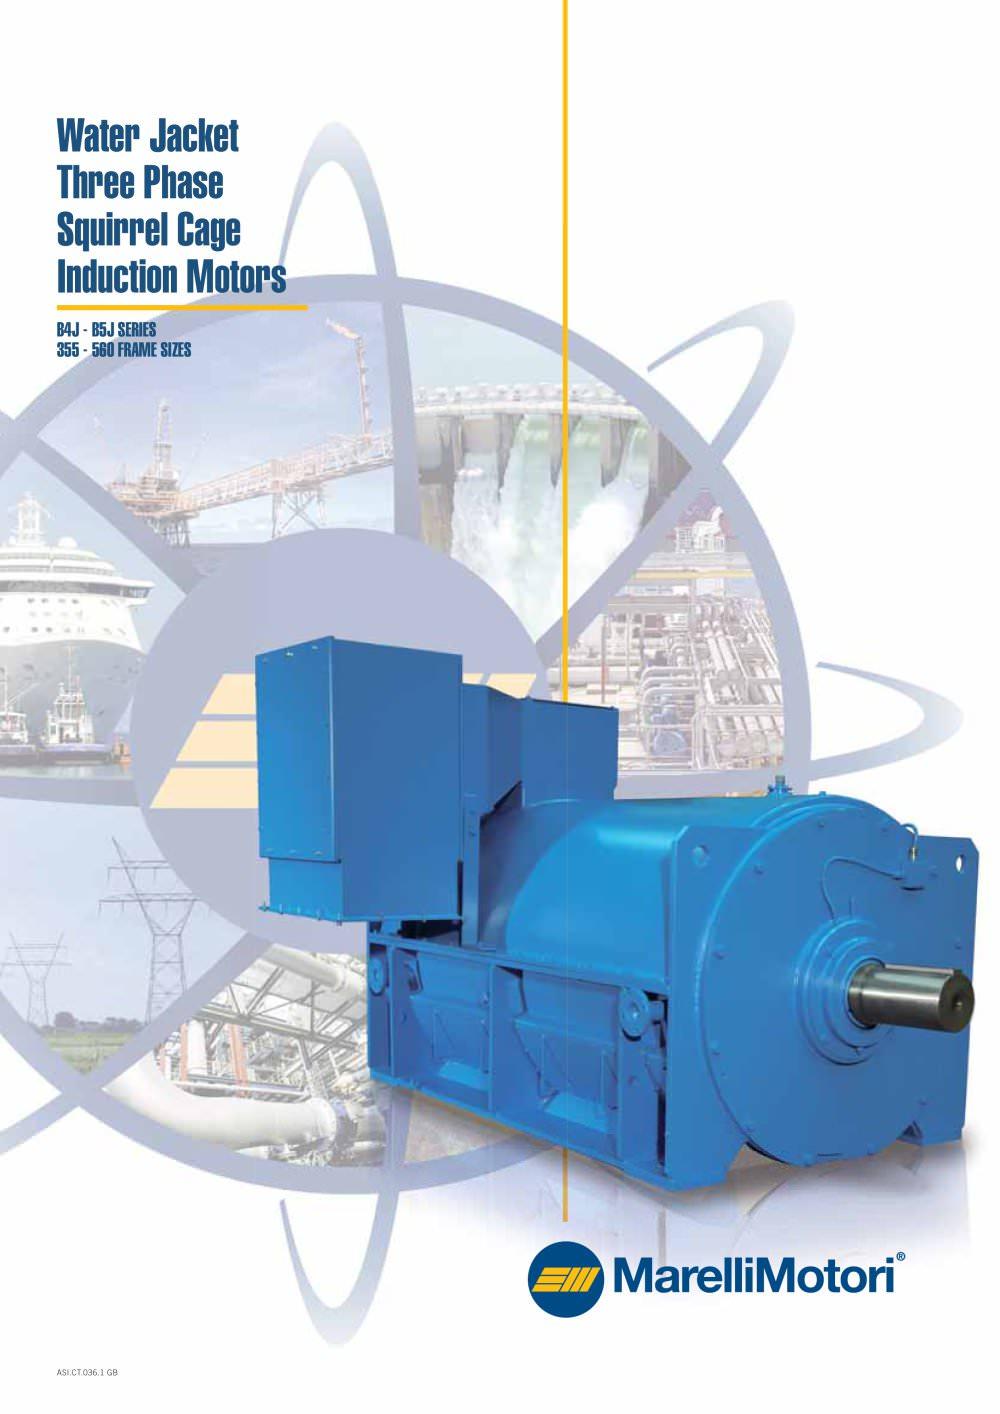 Water Jacket Motors Catalogue - Marelli Motori - PDF Catalogues ...